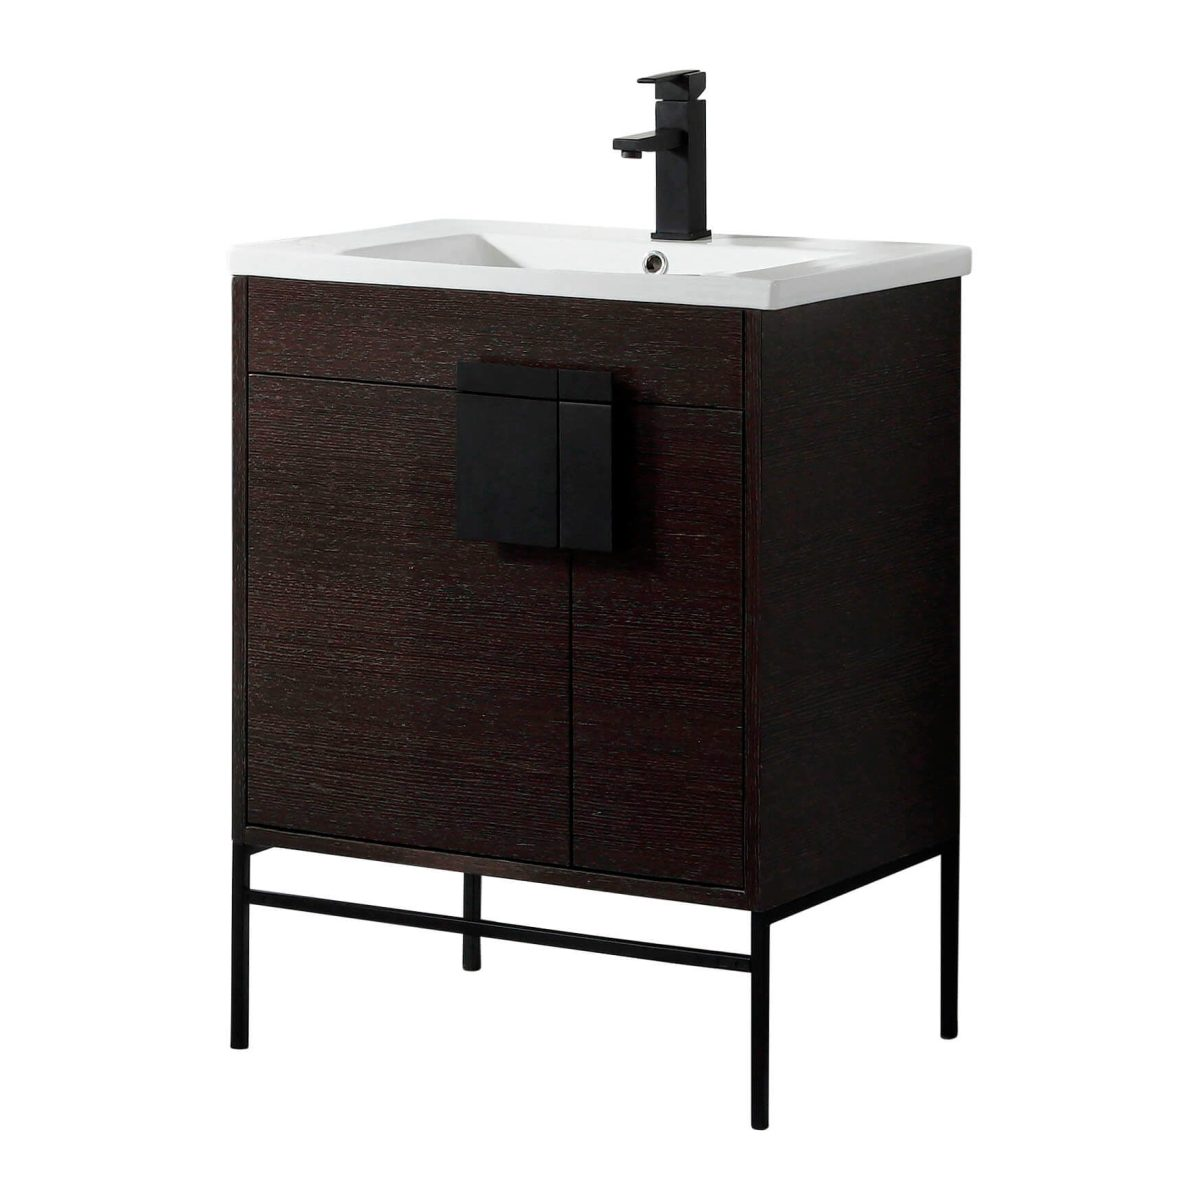 "Shawbridge 30"" Modern Bathroom Vanity  Black Oak Straight Grain with Black Hardware"